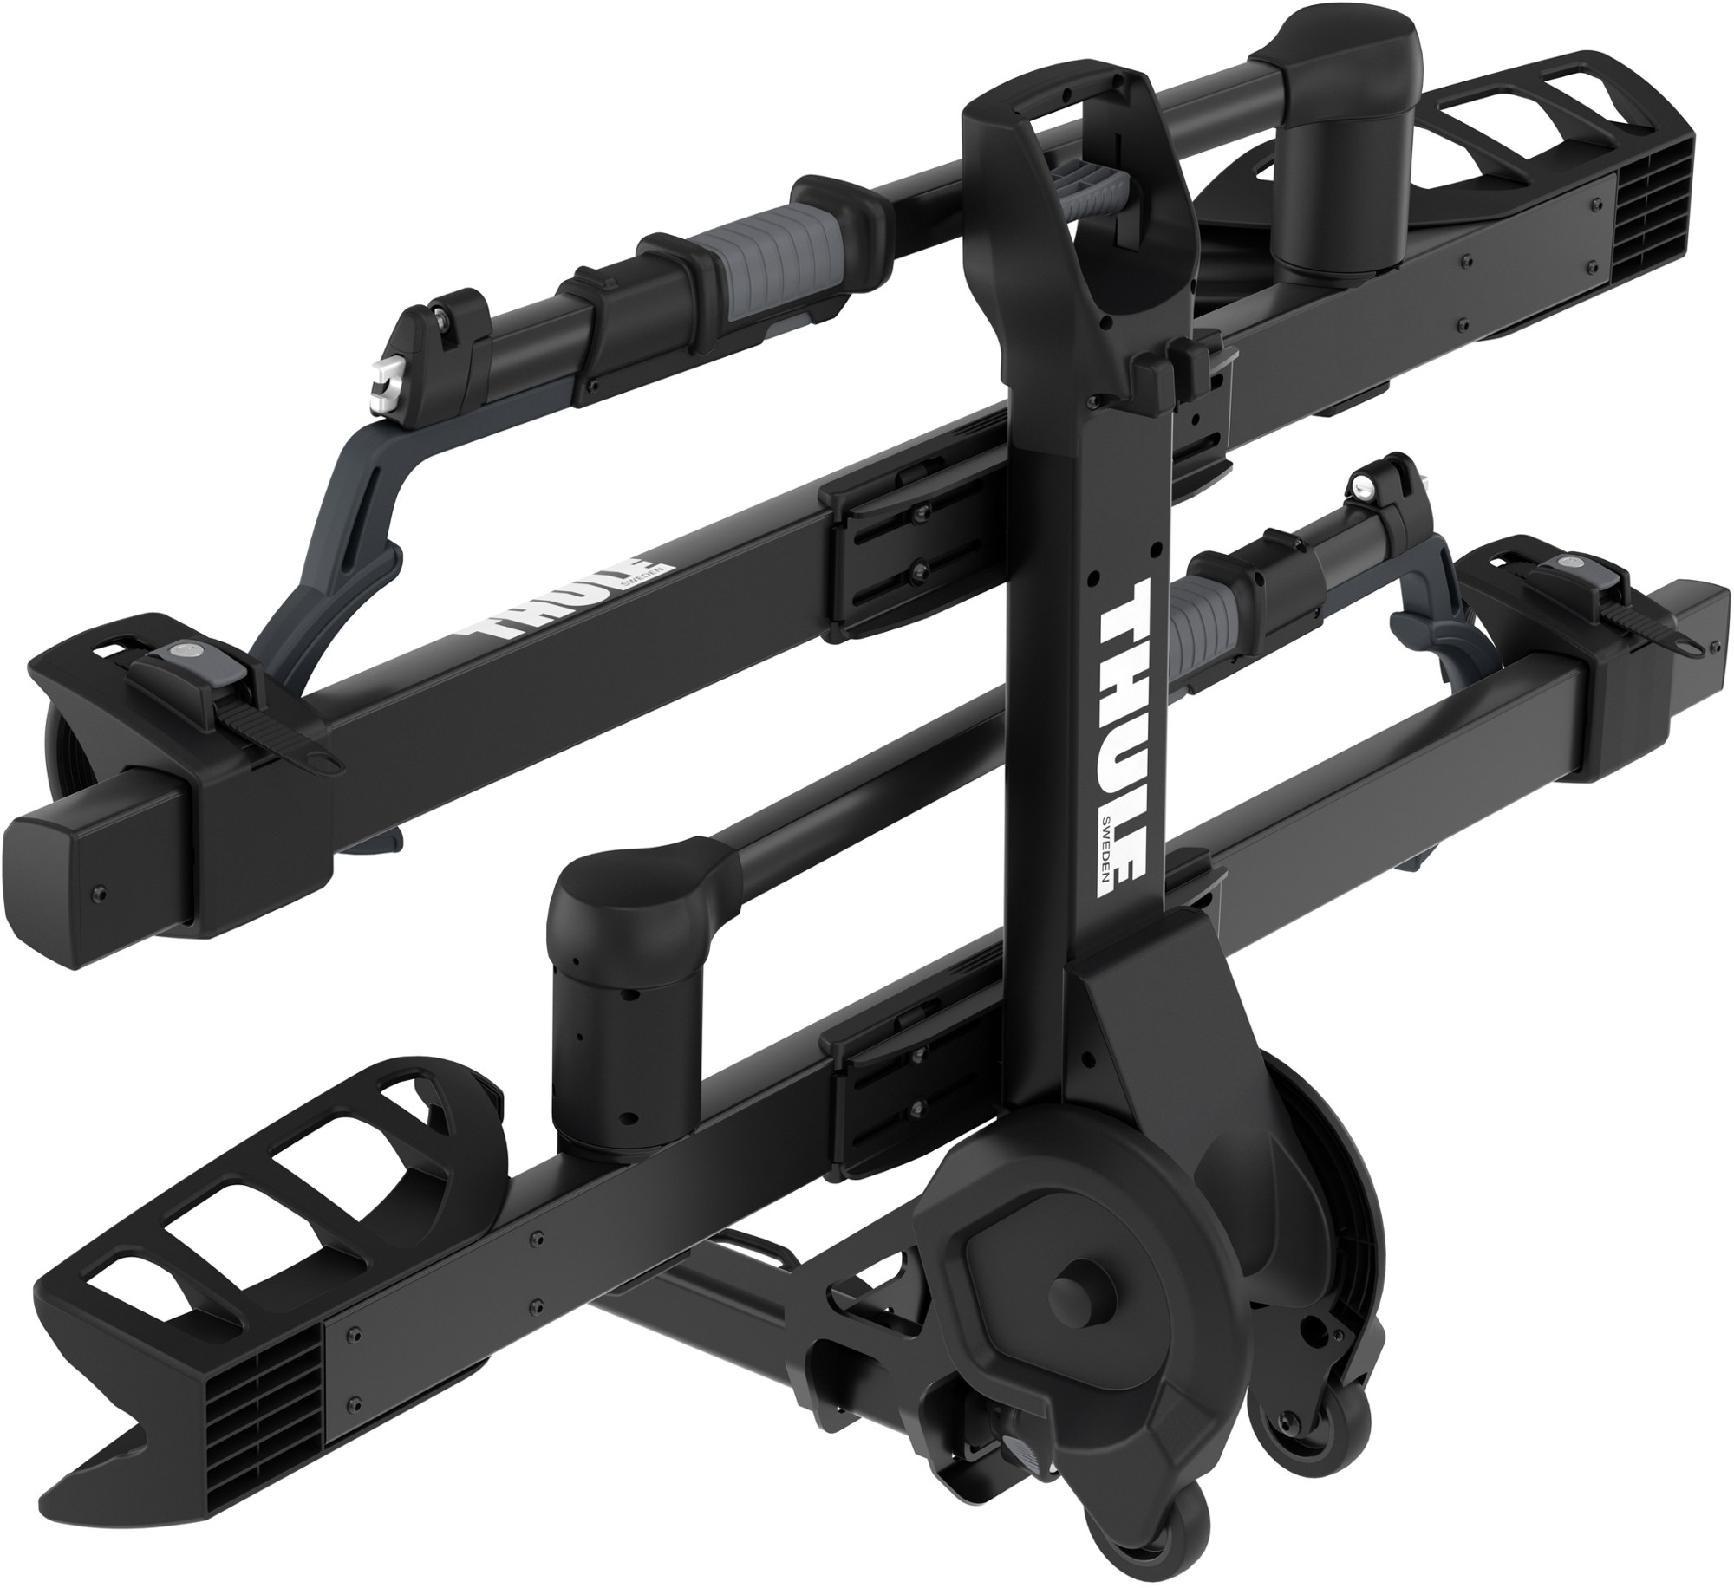 Thule T2 Pro XTR 2-Bike Hitch Rack